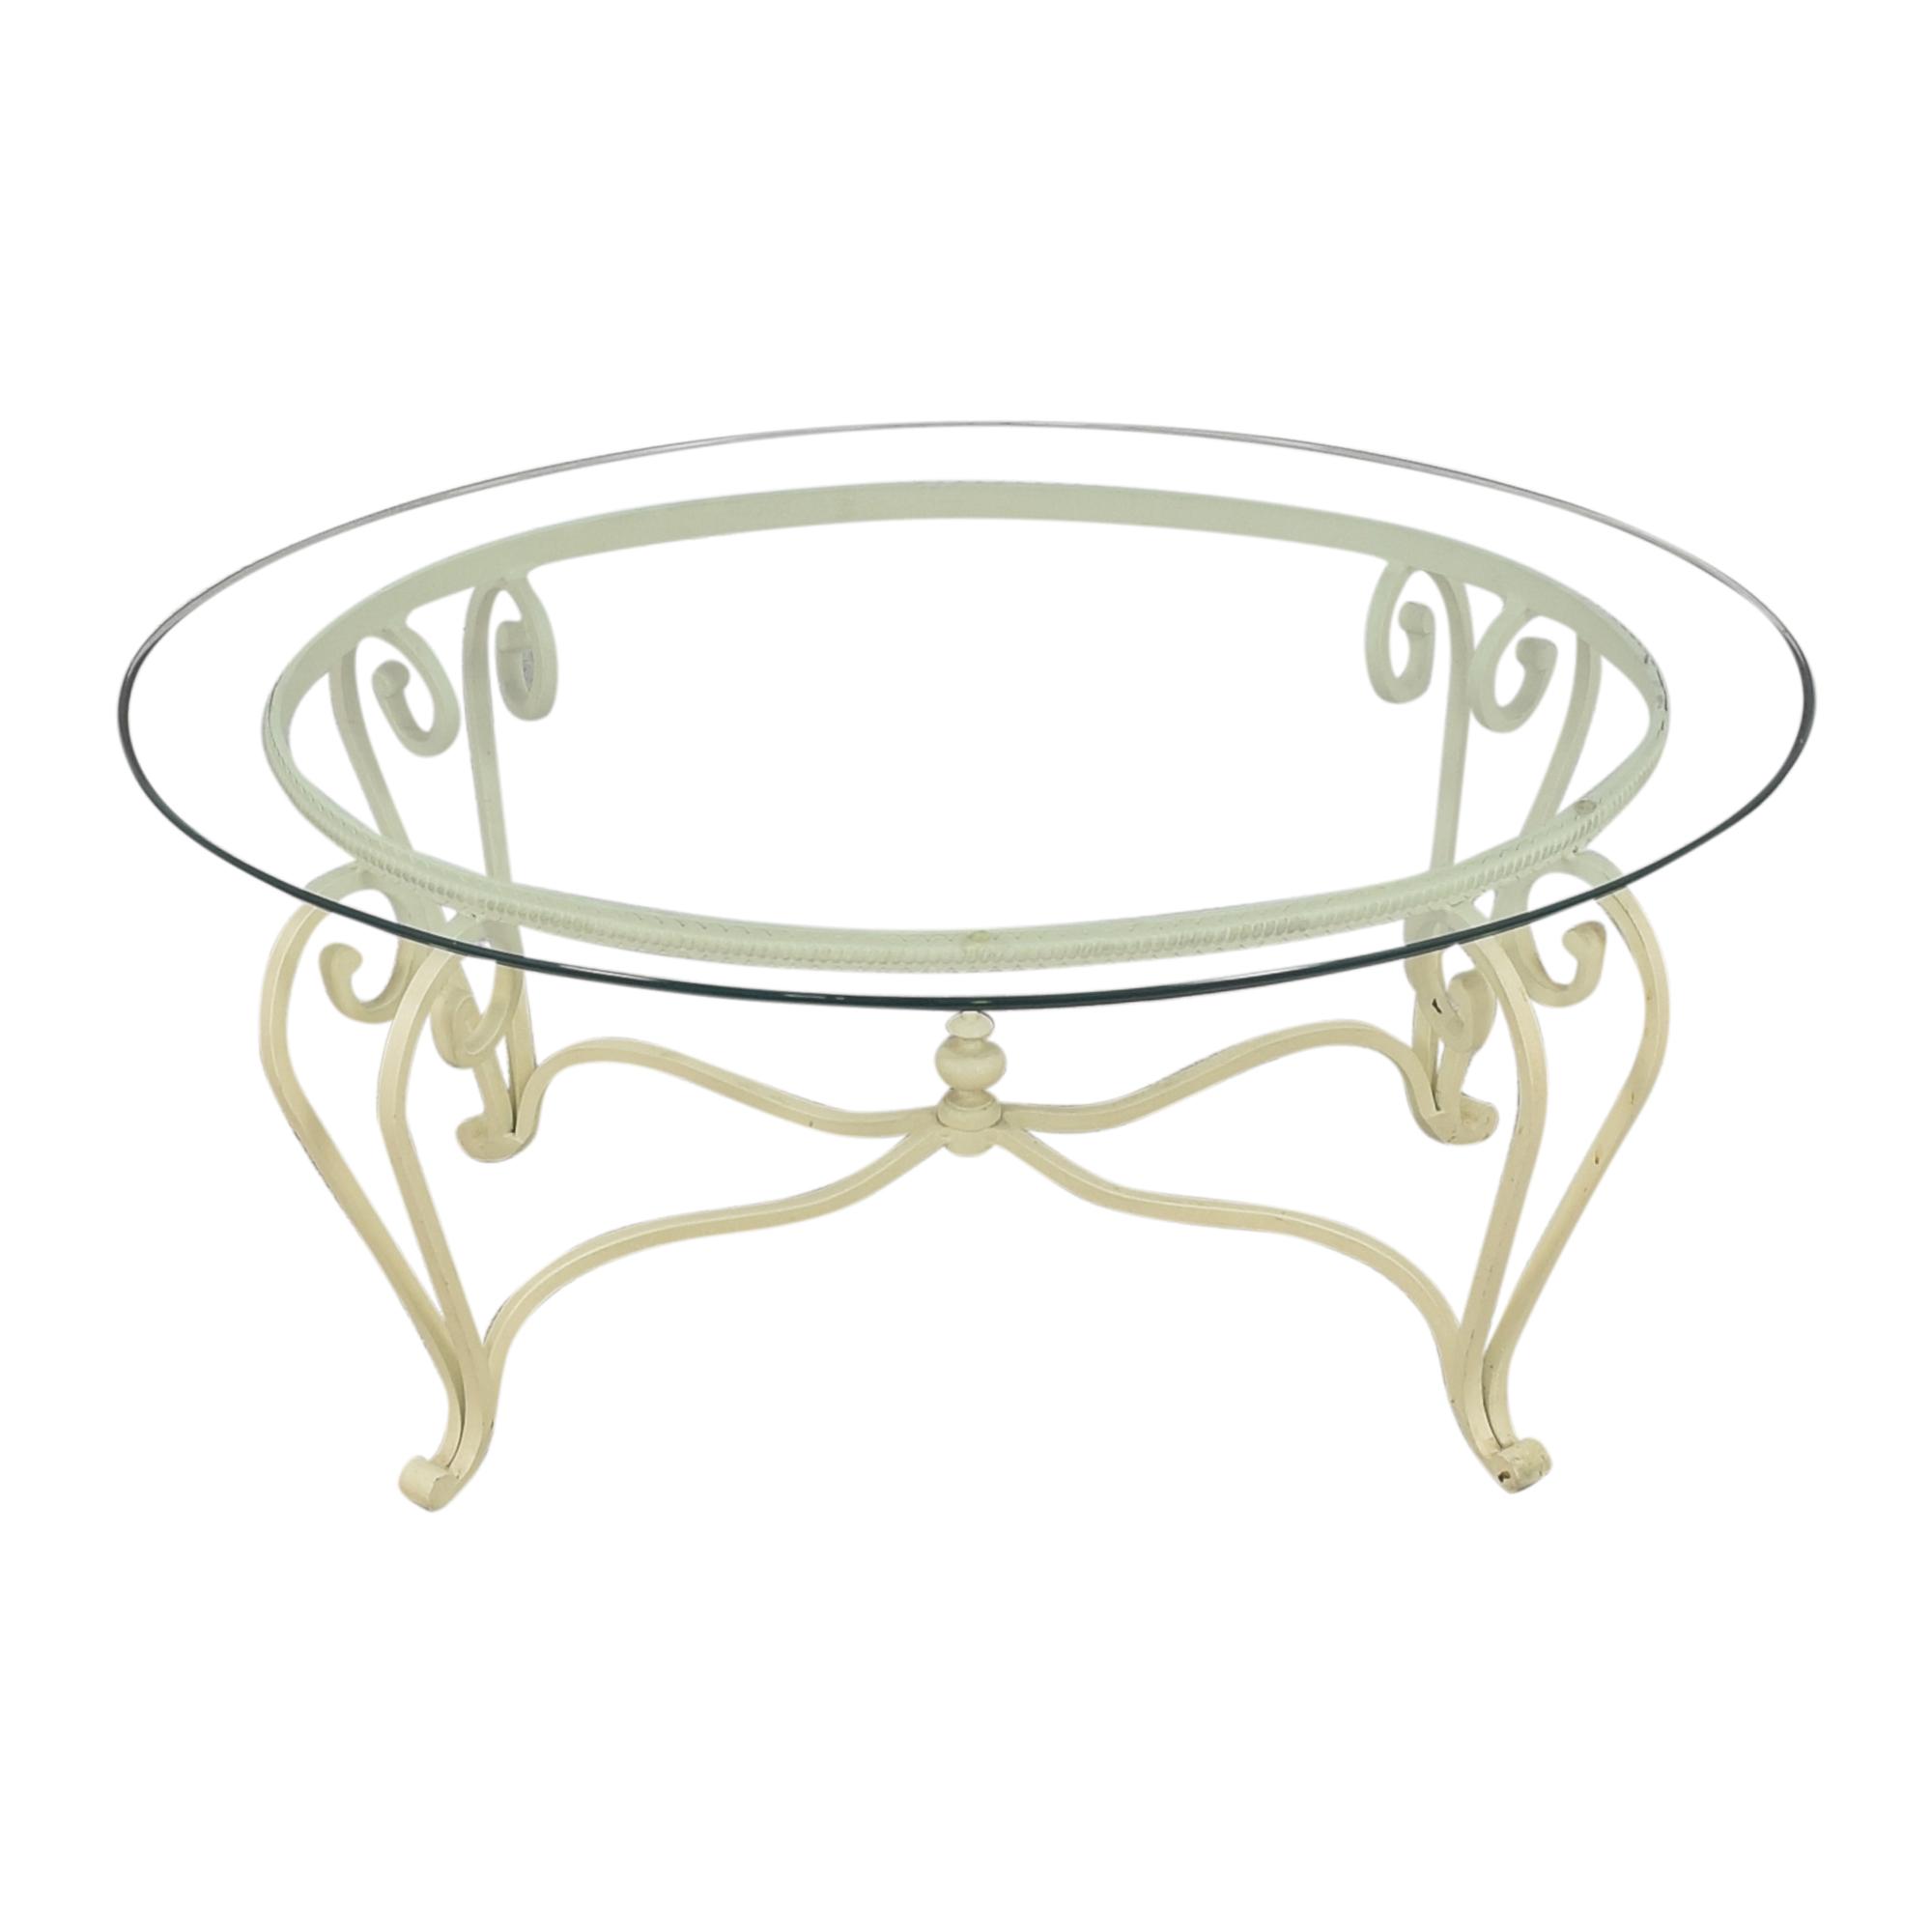 Ethan Allen Ethan Allen Oval Coffee Table on sale